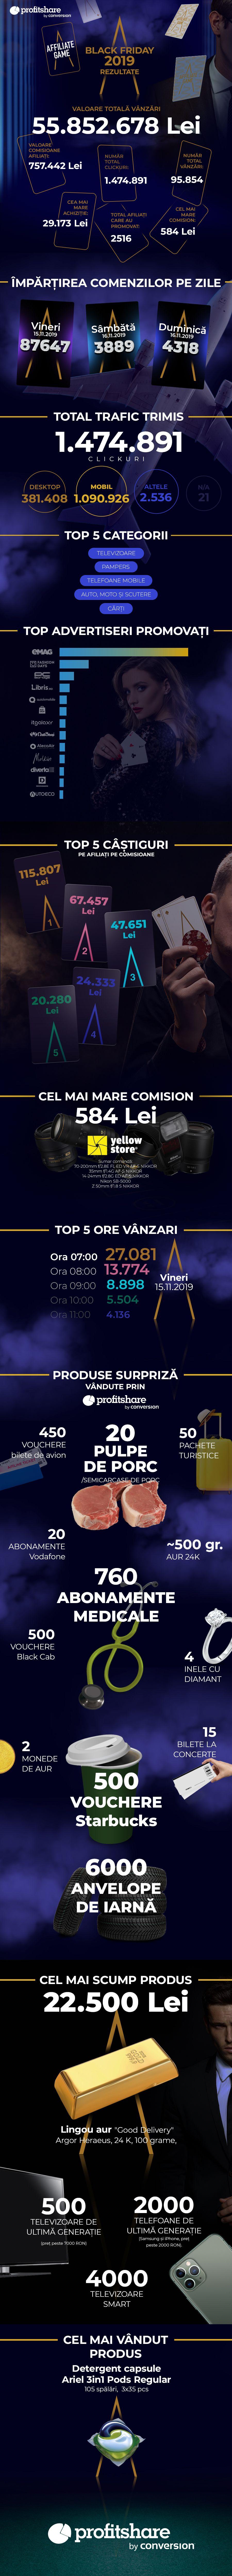 Infografic Profitshare Black Friday 2019